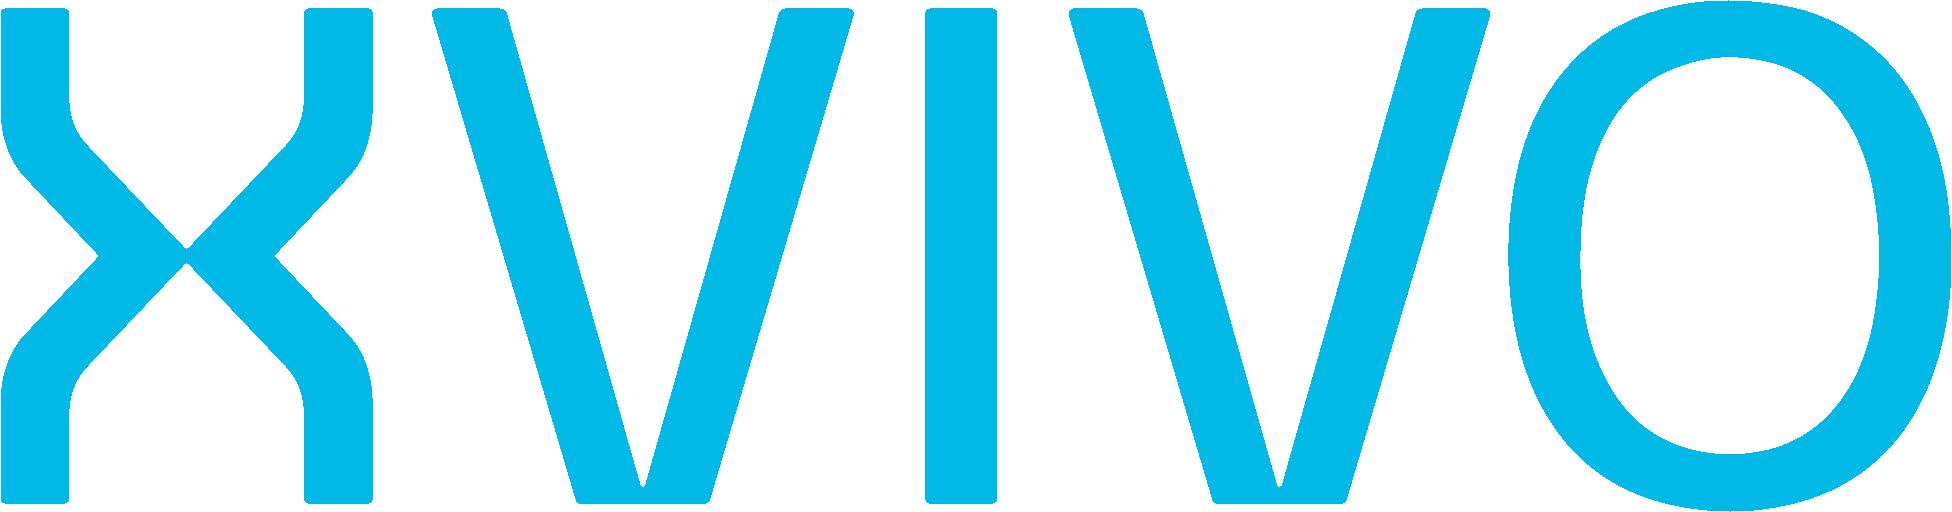 xvivo_logo